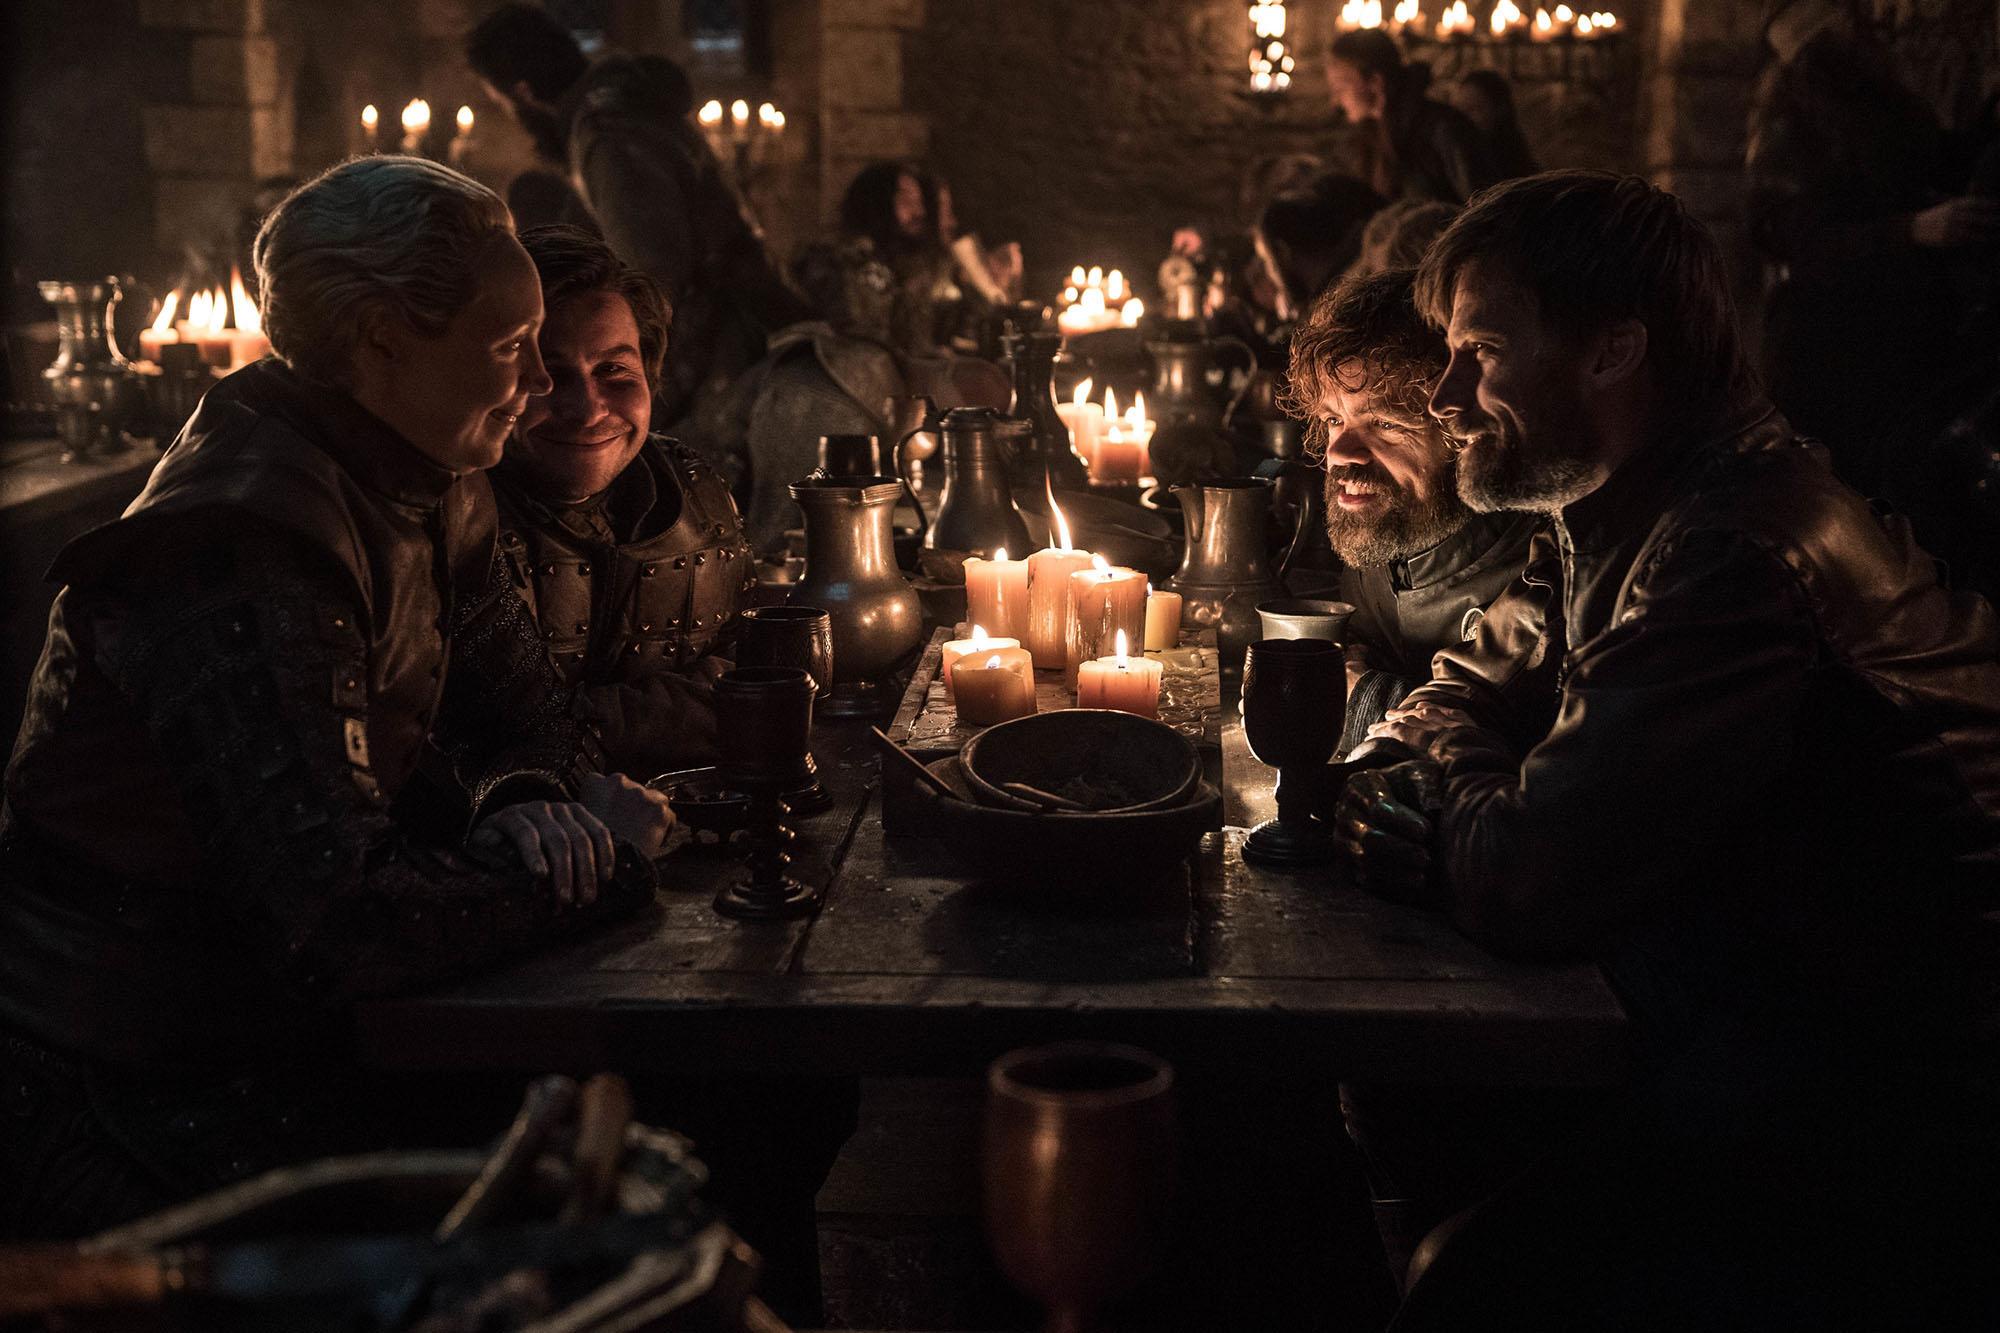 Brienne Podrick Tyrion Jaime Lannister